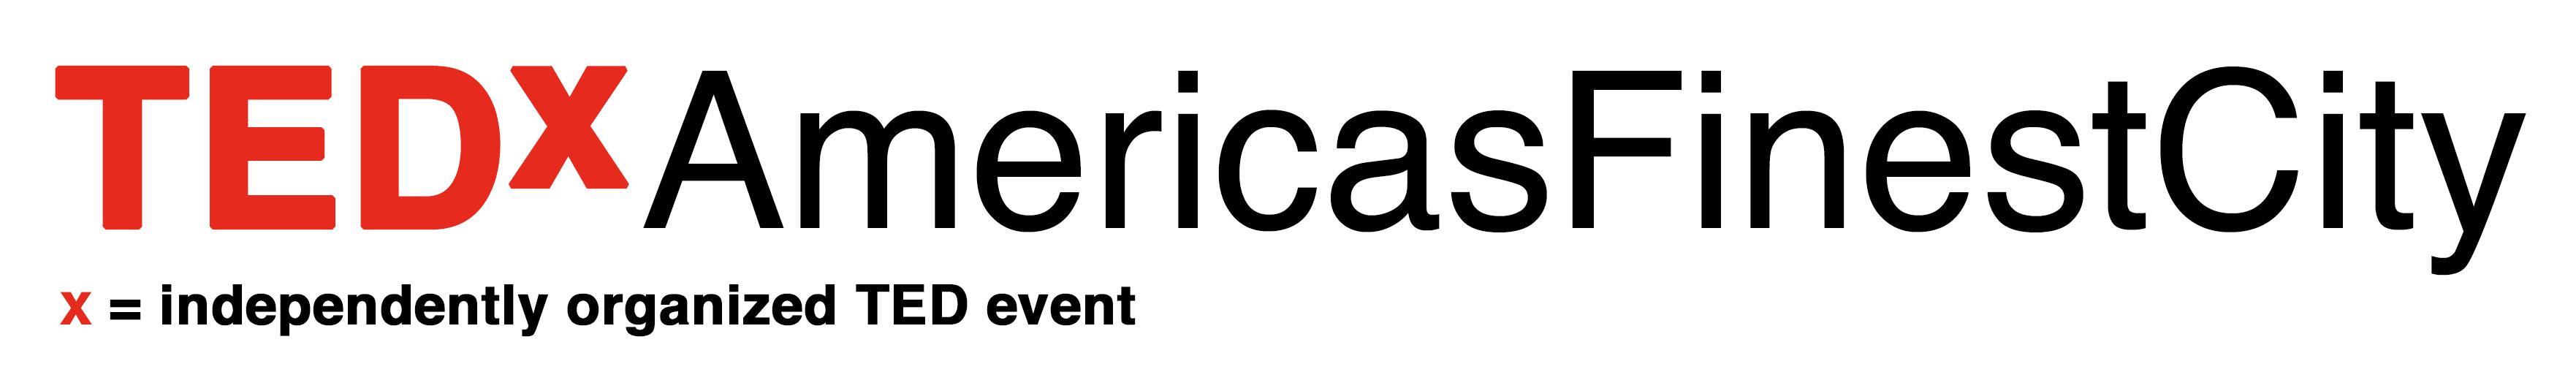 TEDxAmericasFinestCity in San Diego California